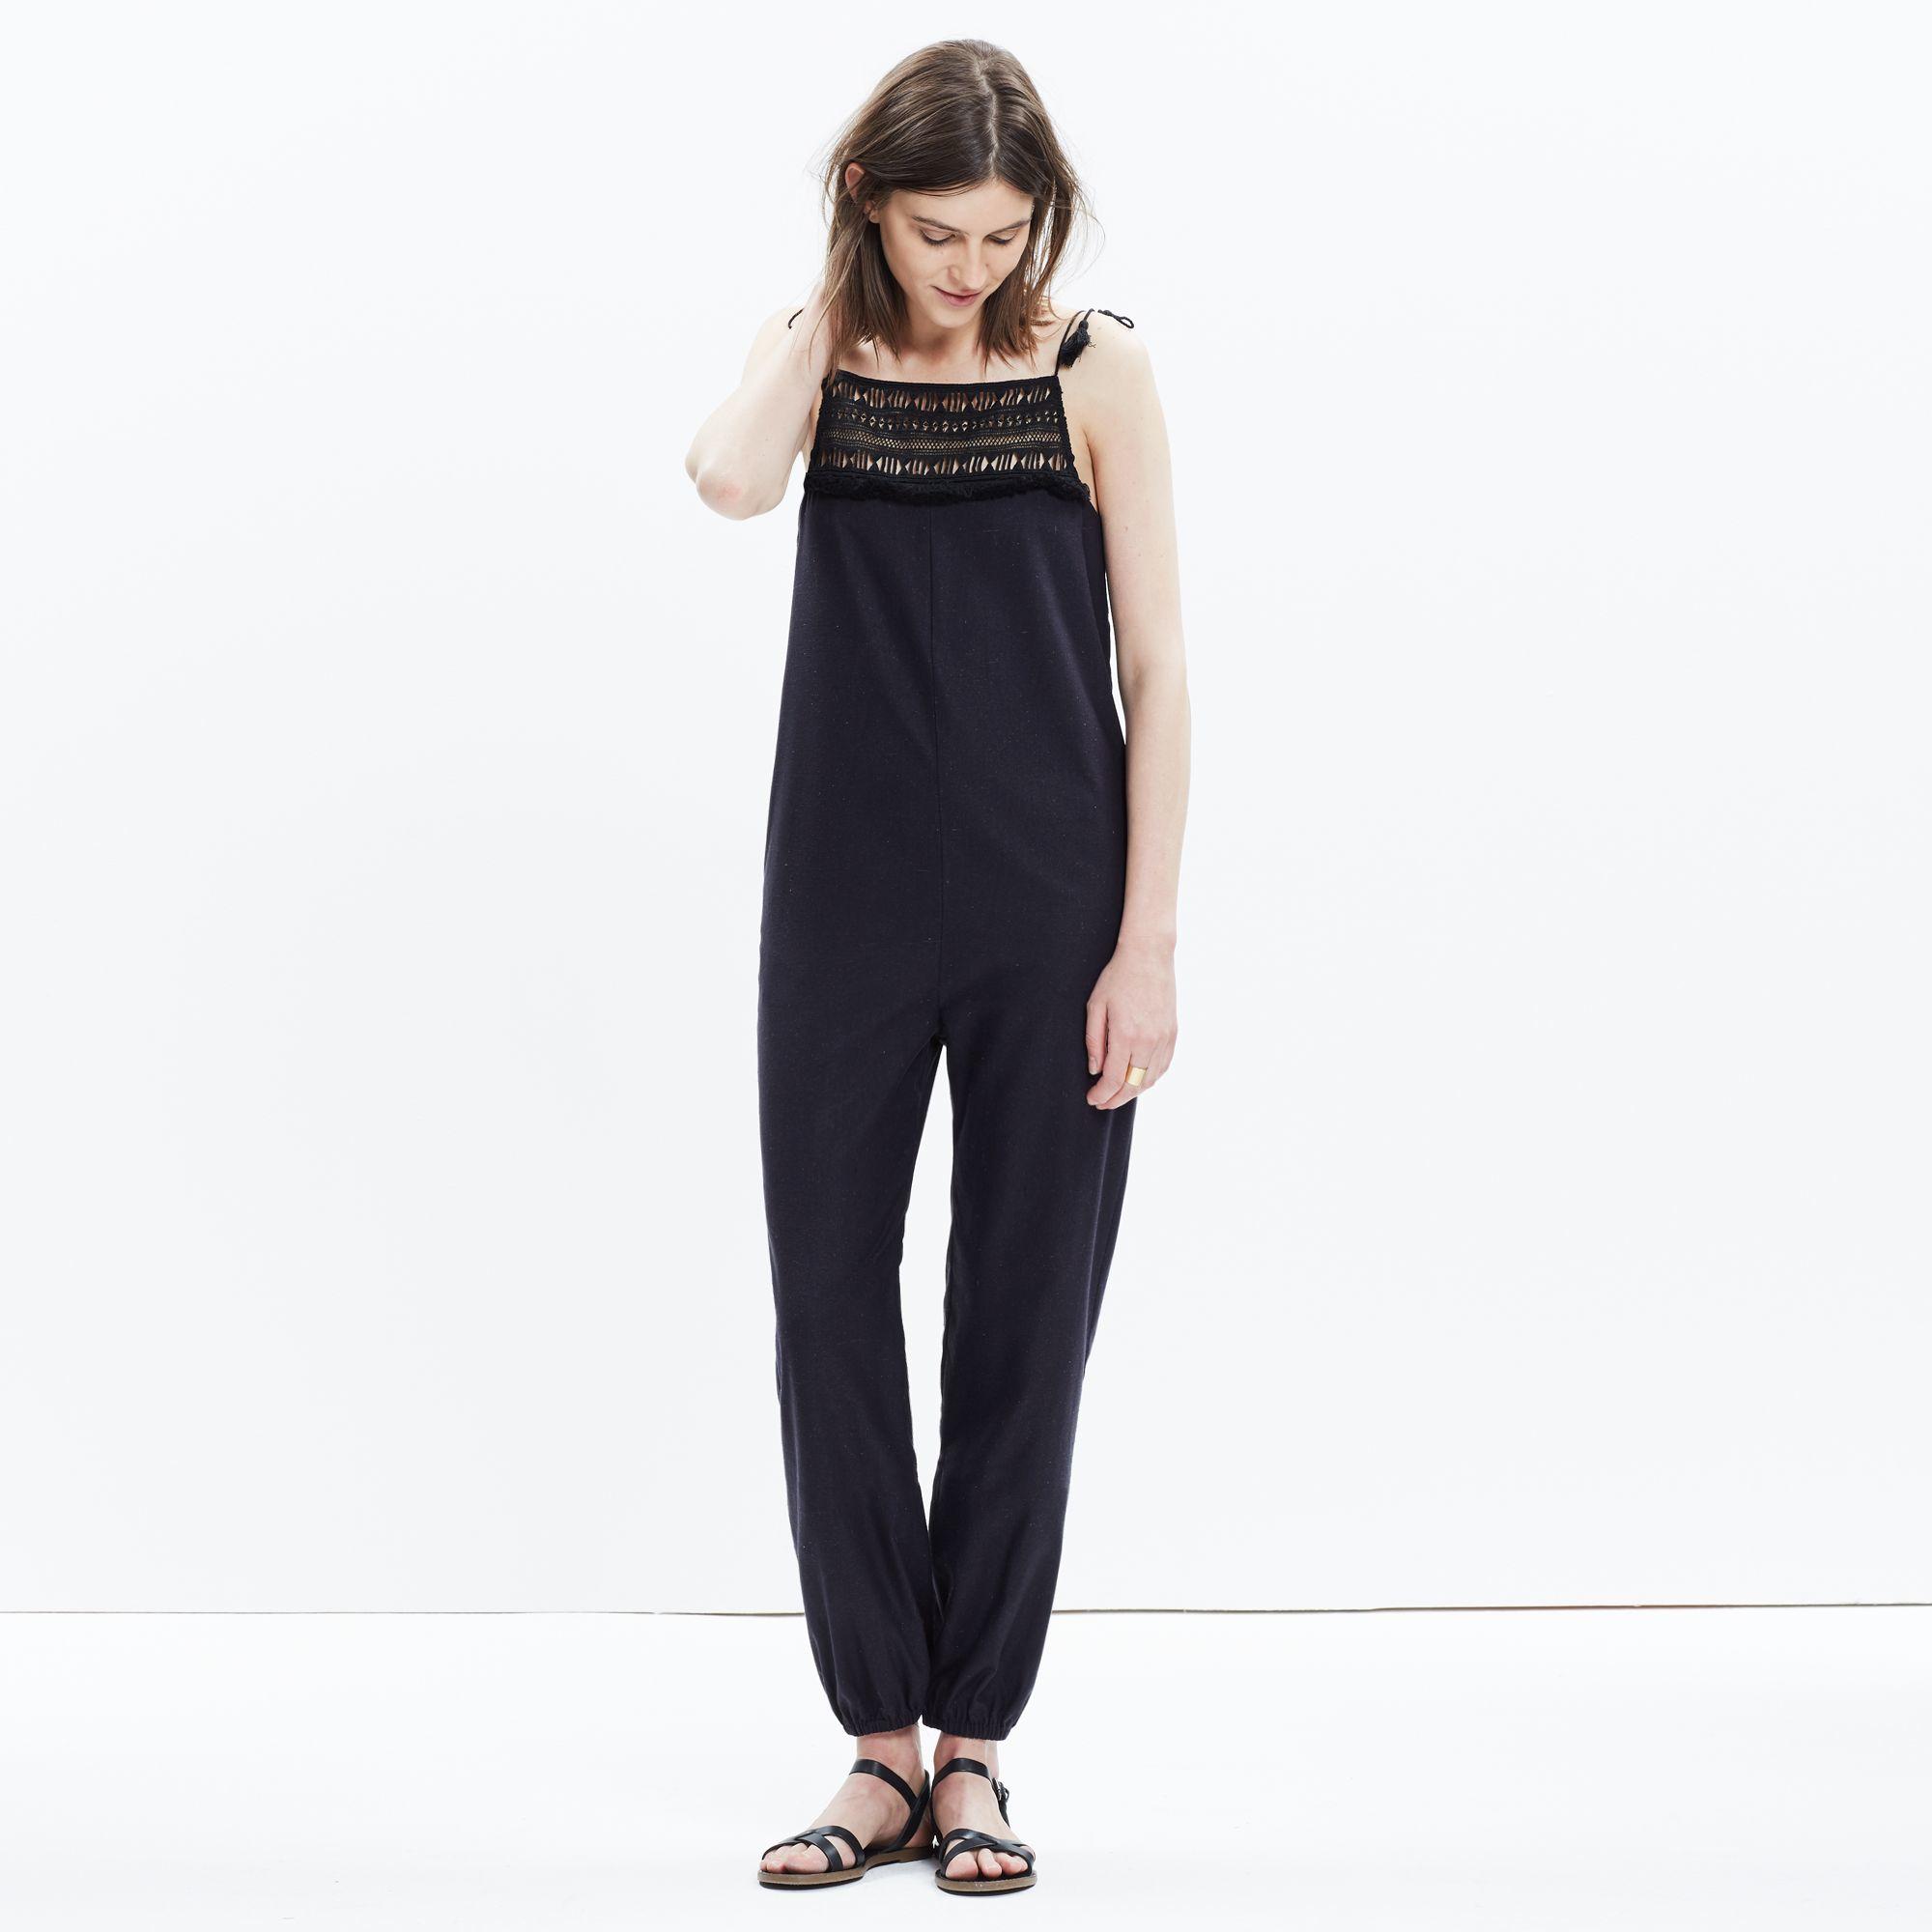 552fb4861438 Madewell Mirasol Fringed Jumpsuit in Black